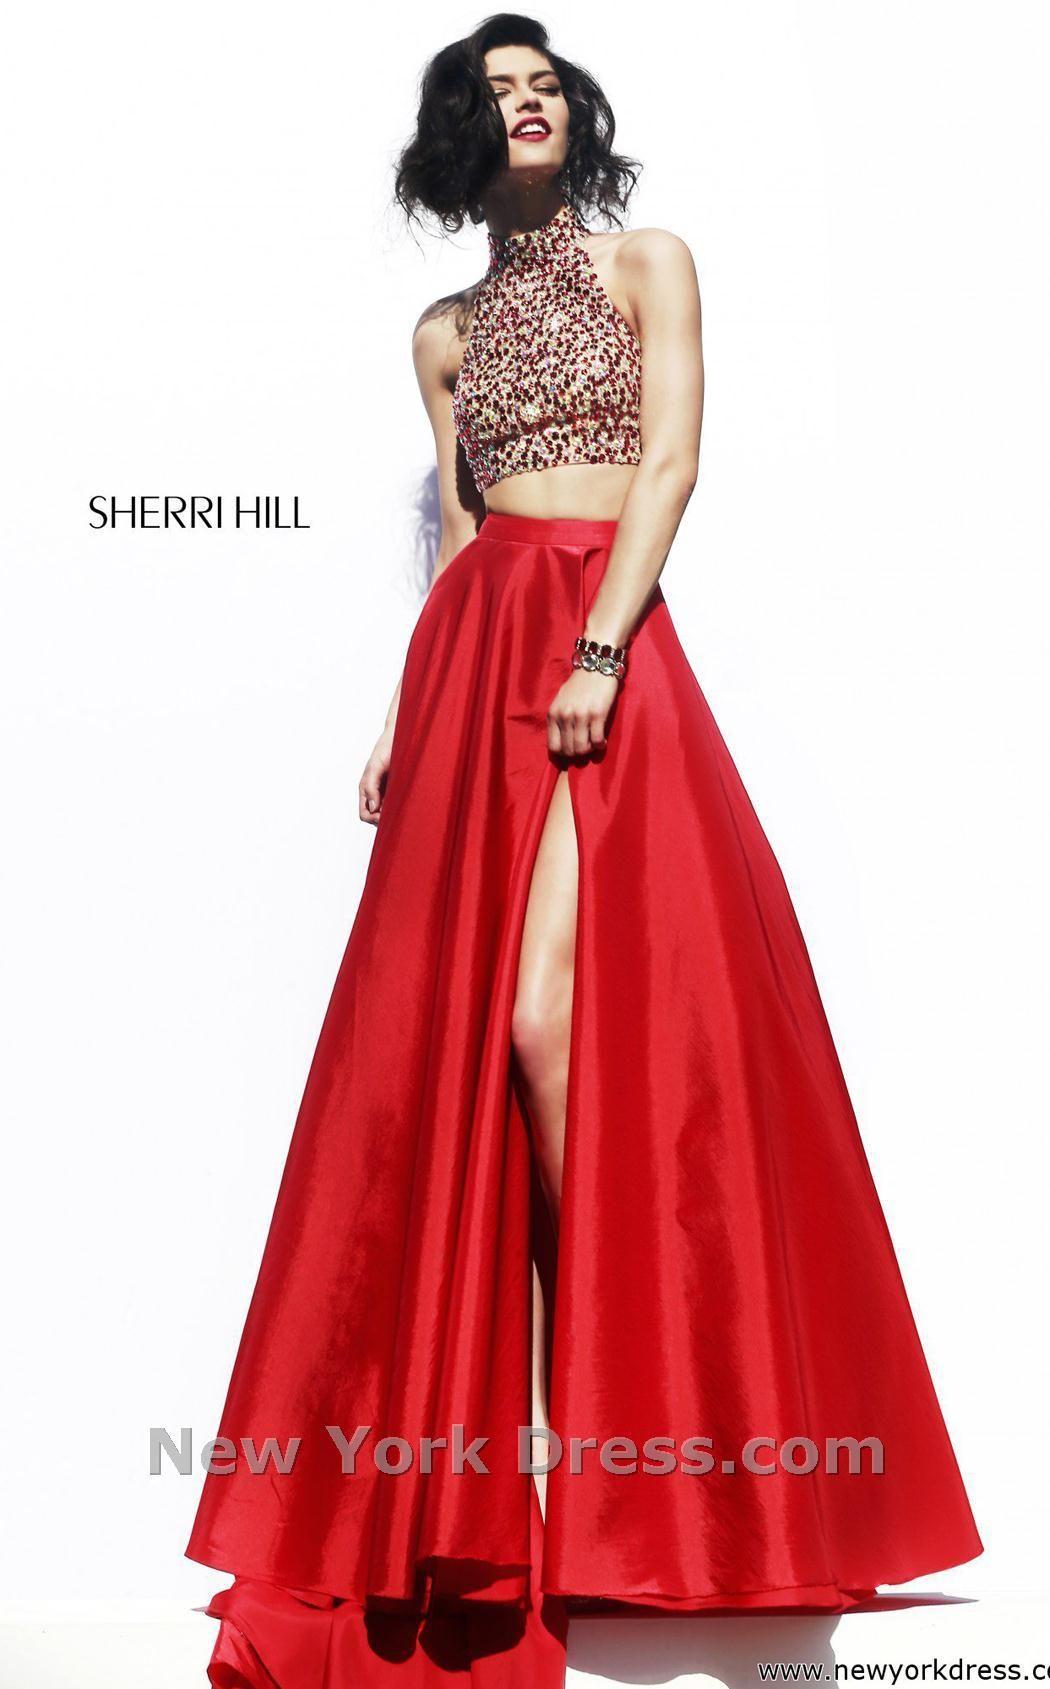 Sherri hill dress bodice prom and ring